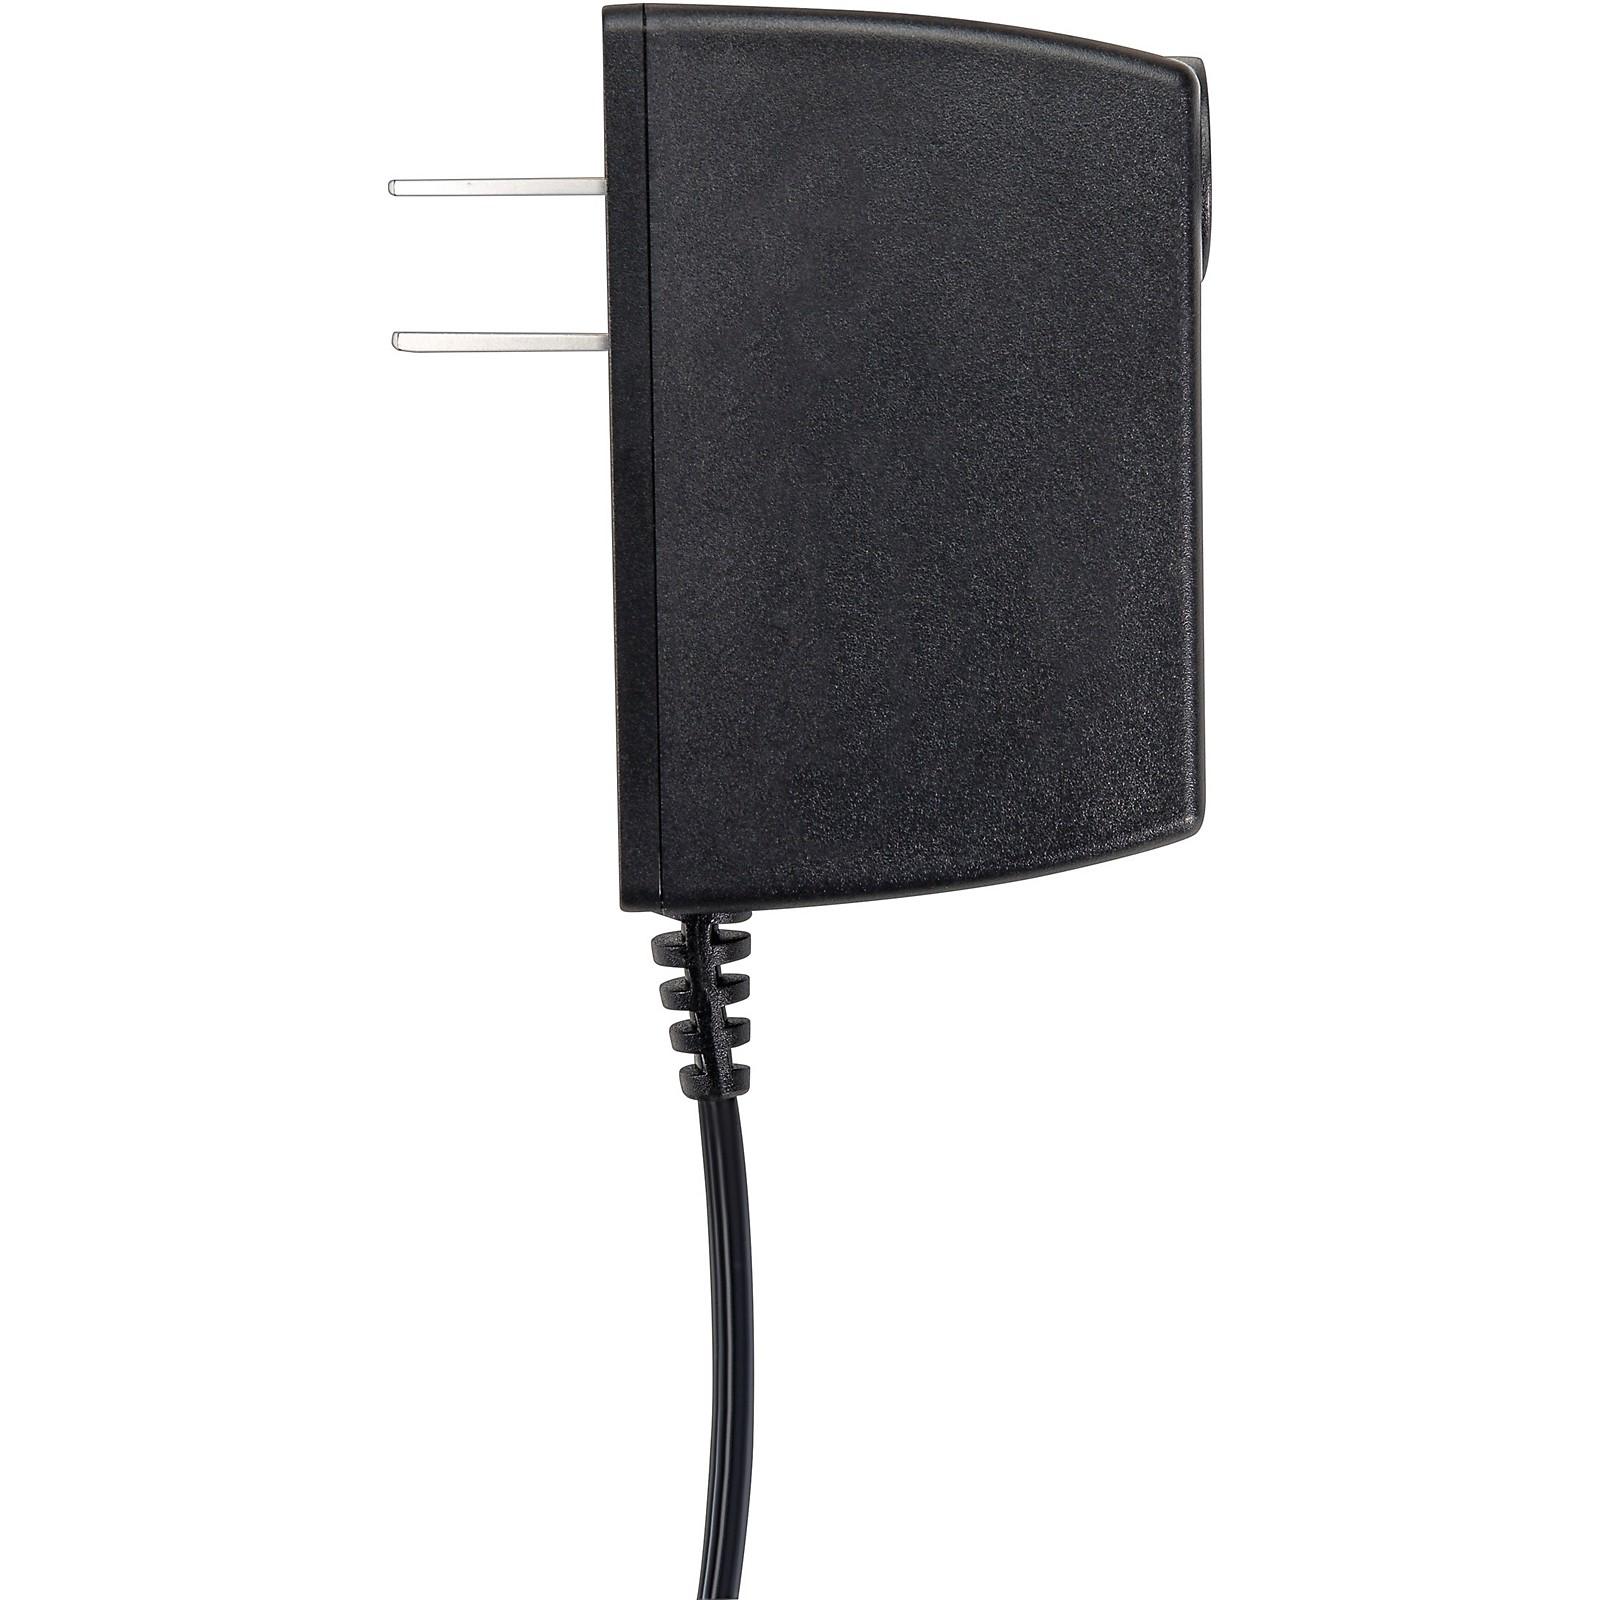 Livewire PH1700 9V Slimline Power Supply Regular